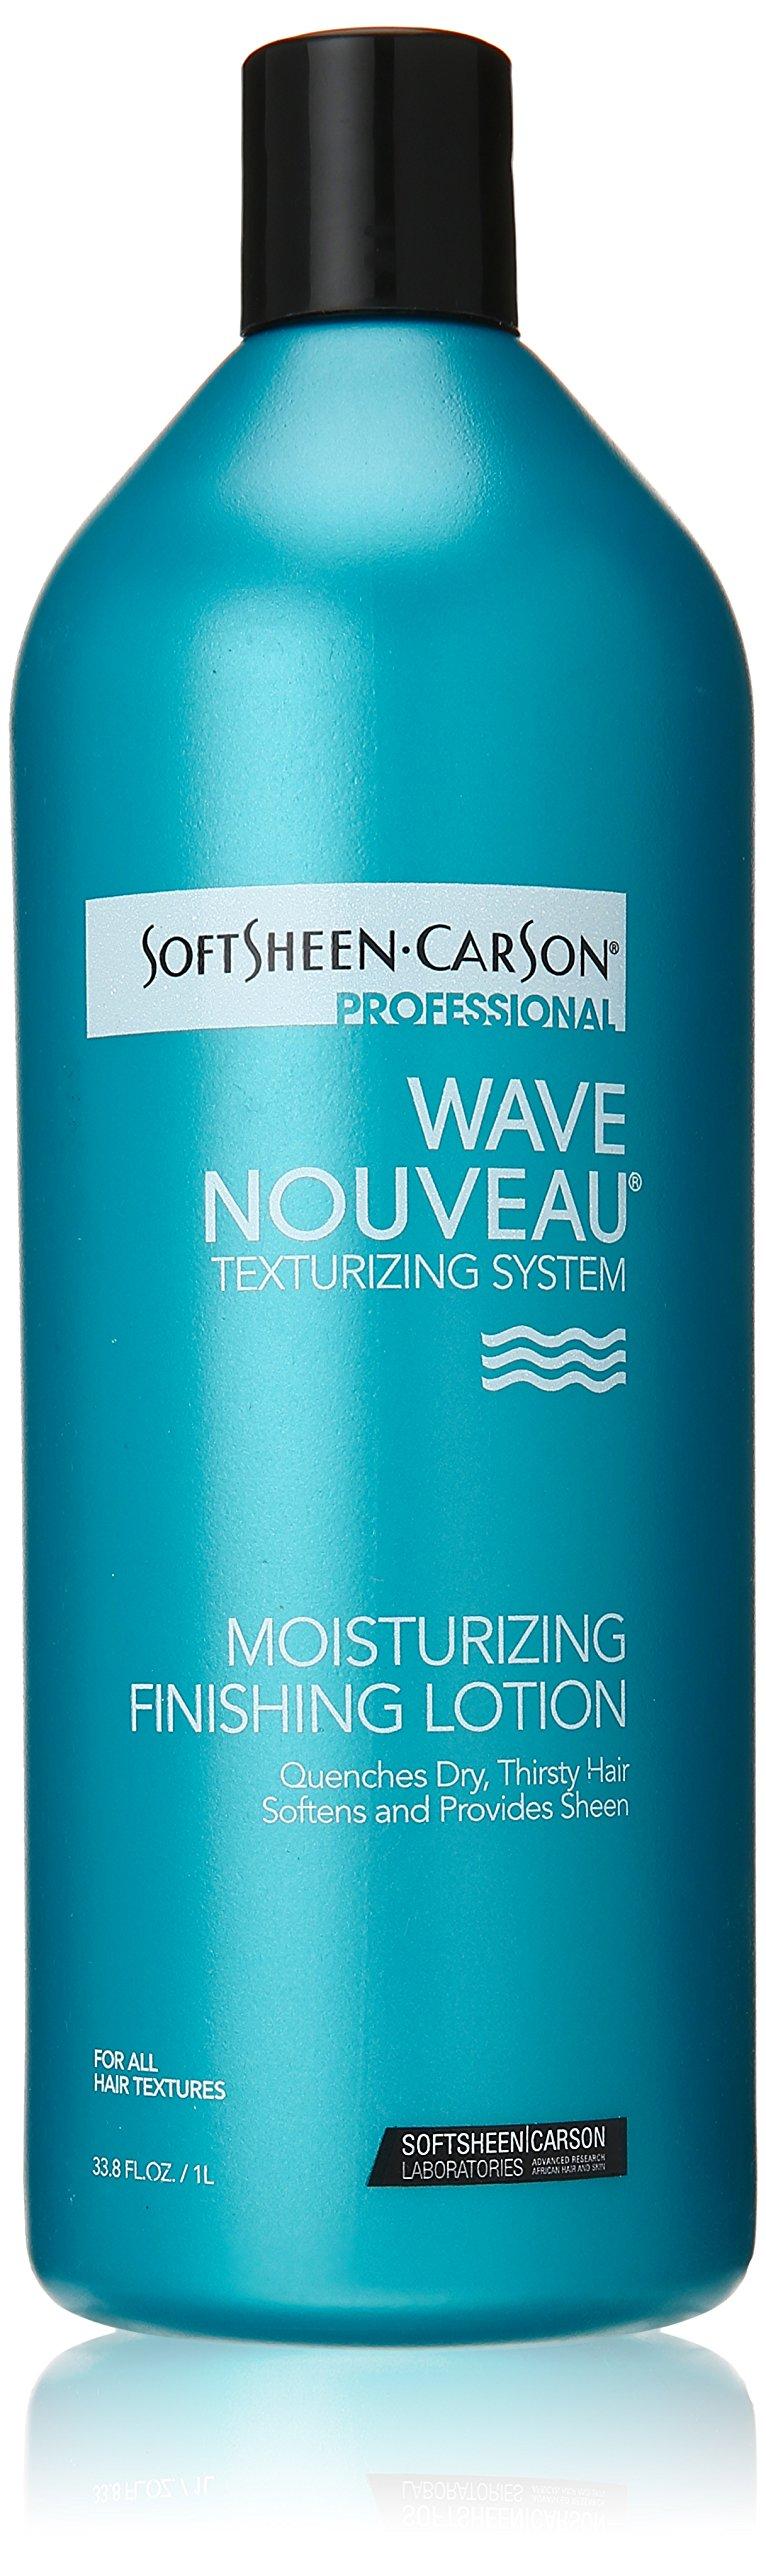 Wave Nouveau Moisturizer Finishing Lotion 33.8 oz by SoftSheen-Carson